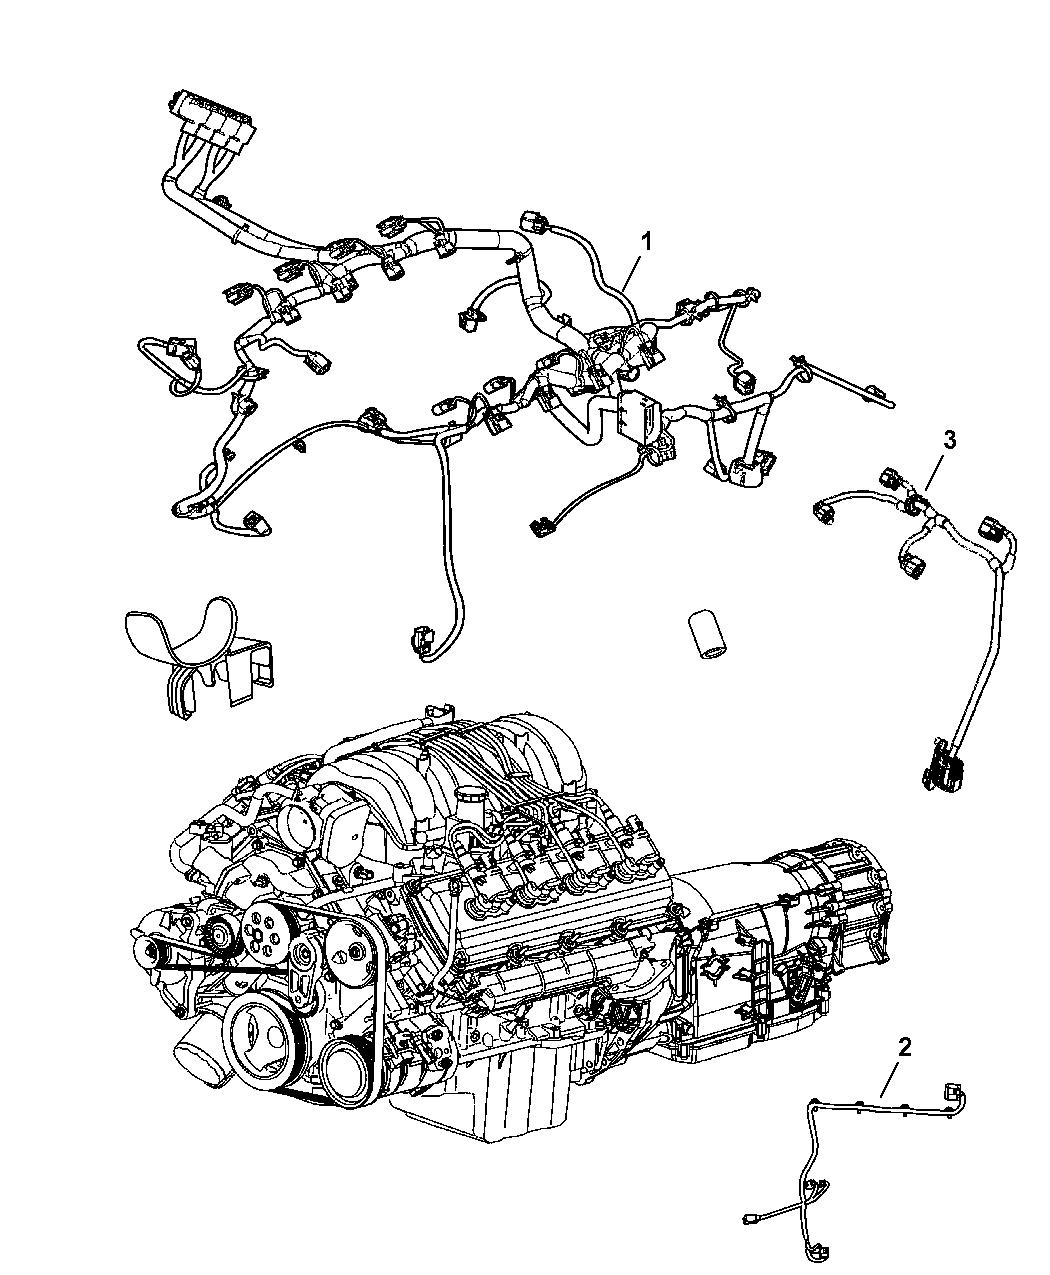 2008 Jeep Grand Cherokee Wiring - Engine - Thumbnail 2